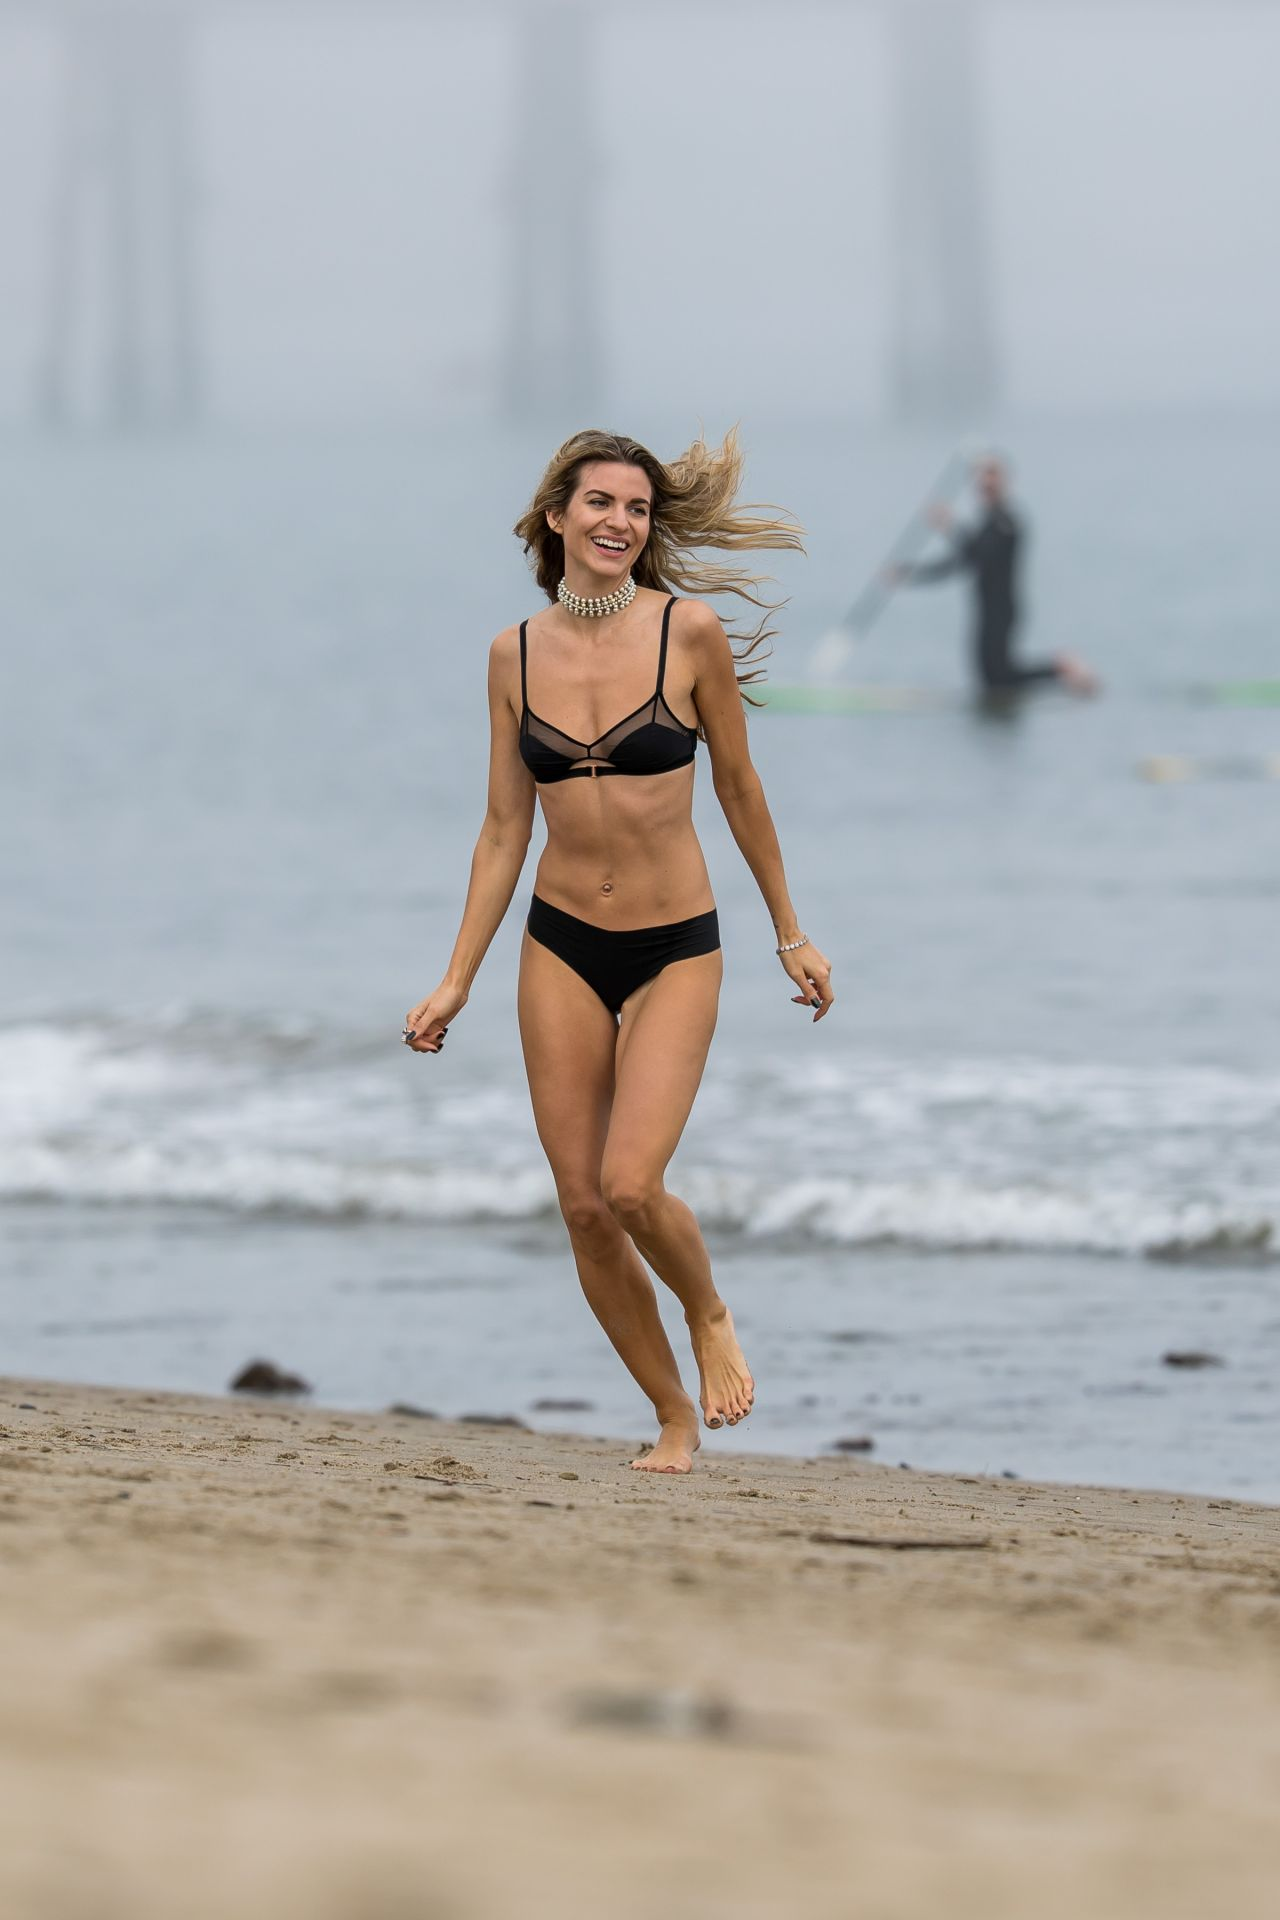 Rachel McCord in Black Bikini at a beach in Malibu Pic 10 of 35